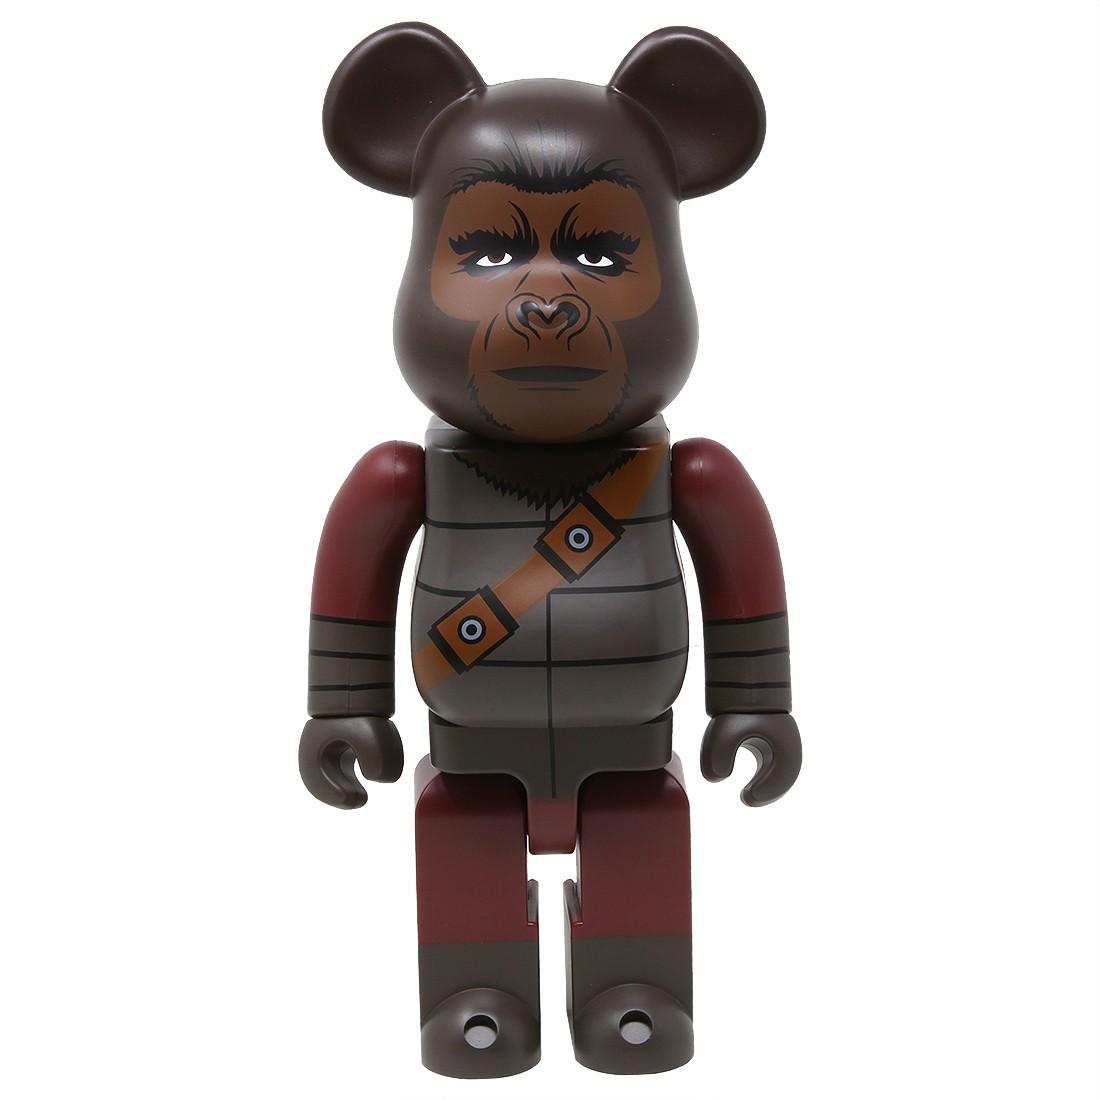 Medicom Planet of the Apes Soldier Ape 400% Bearbrick Figure (gray)